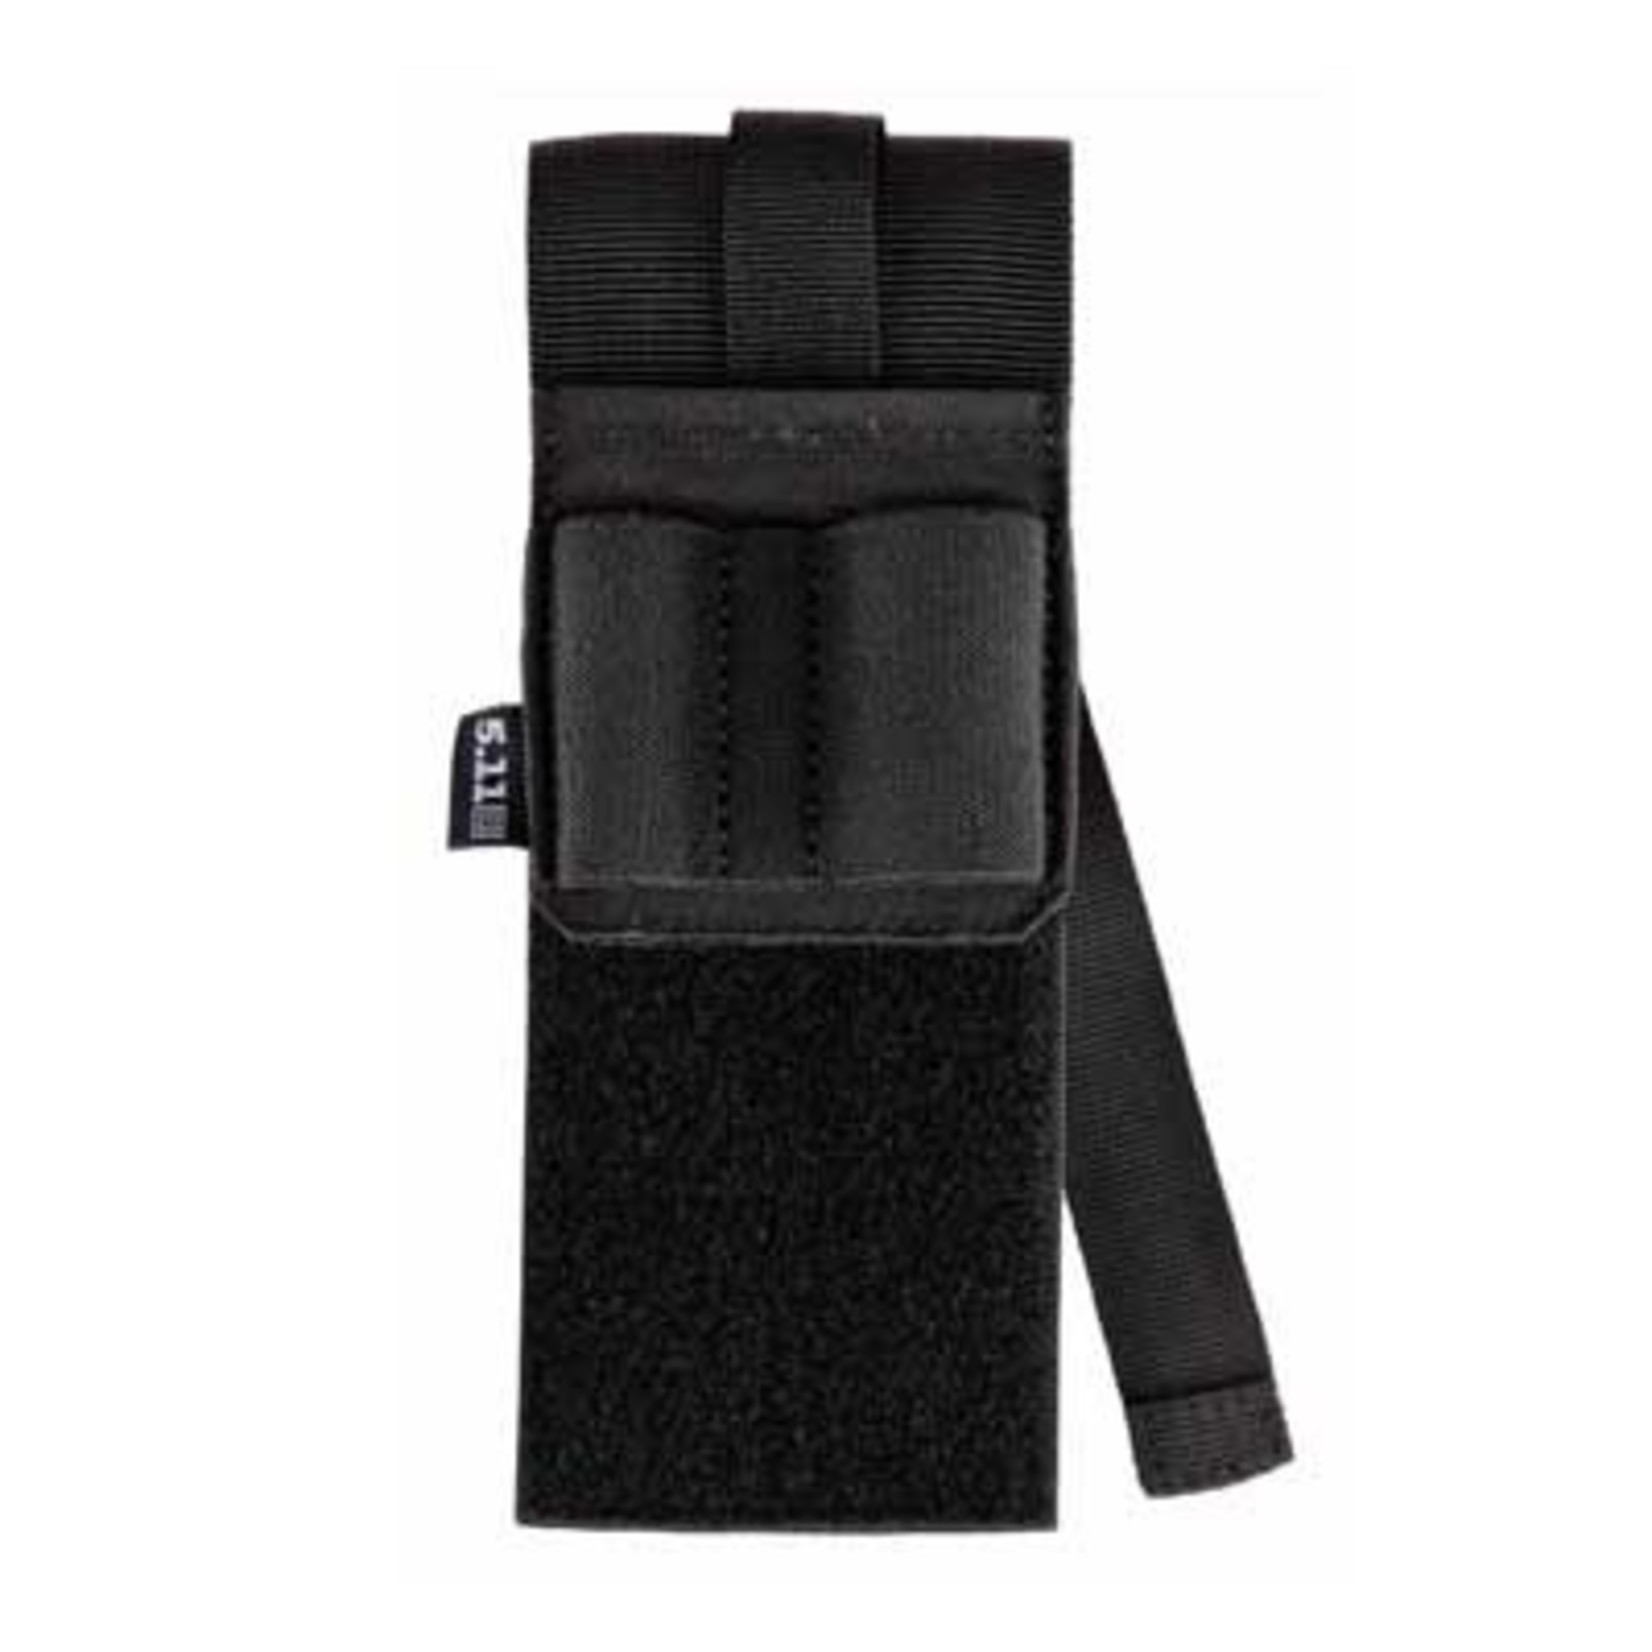 5.11 Tactical 5.11 Light-writing Sleeve-Notebook Wrap/Bookmark